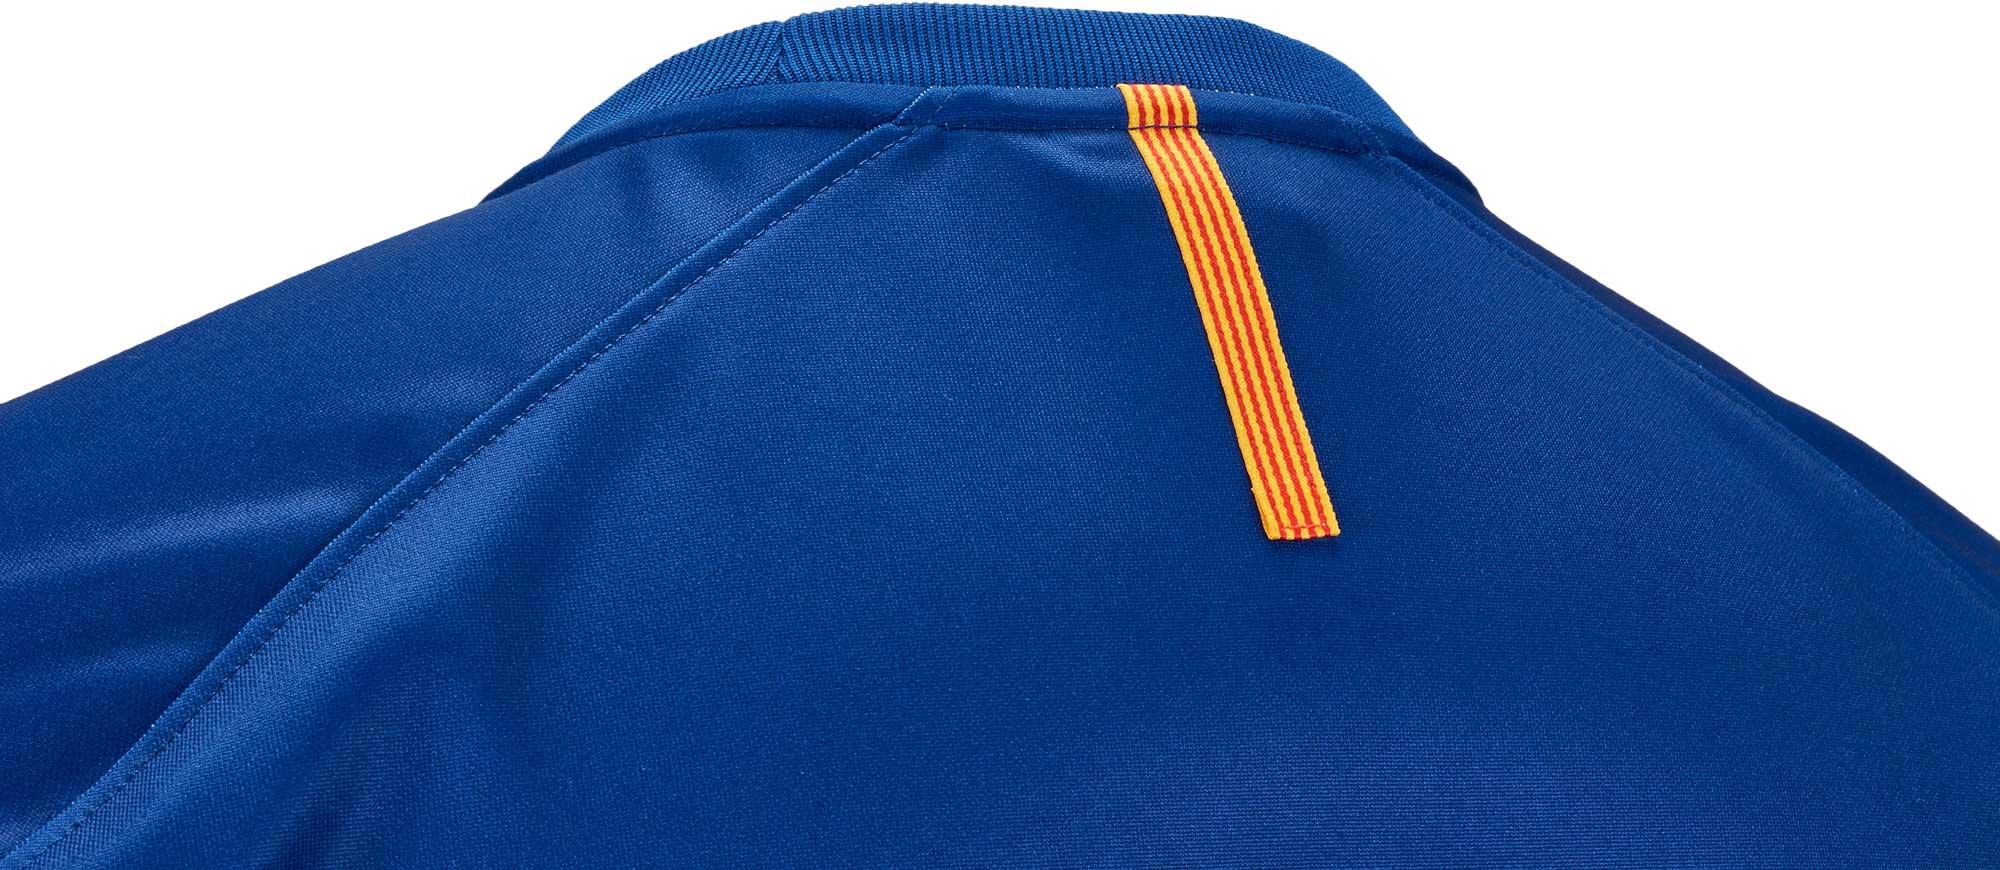 Nike barcelona training top nike barcelona shirts for Blue barcelona